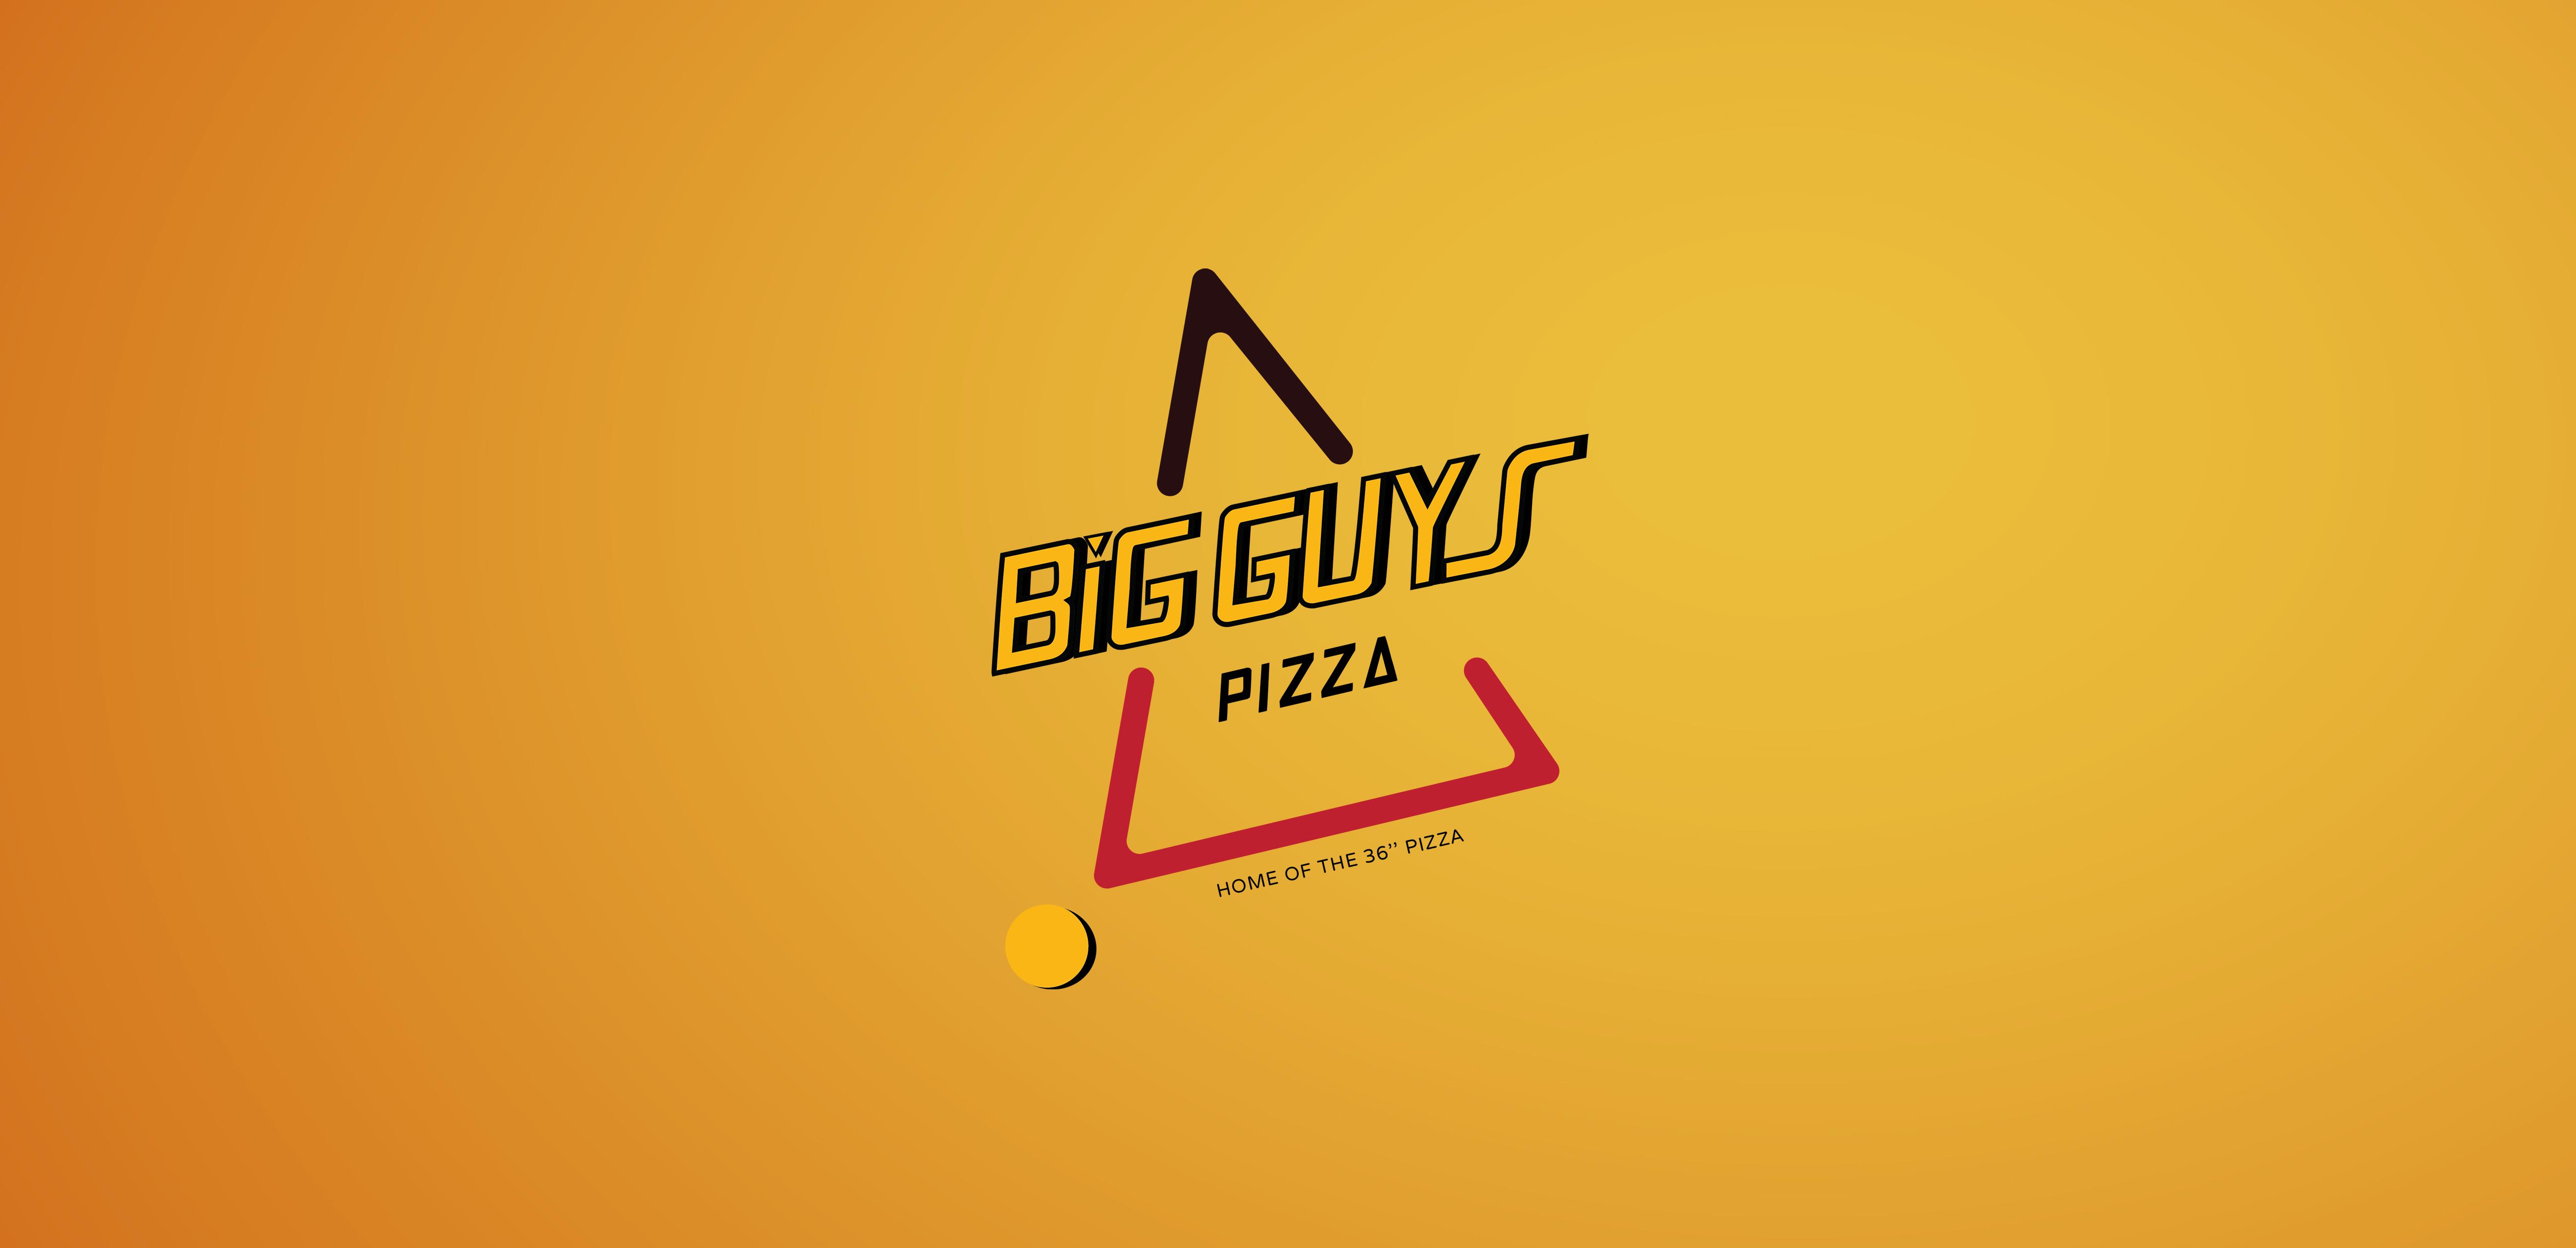 BigGuys_logo